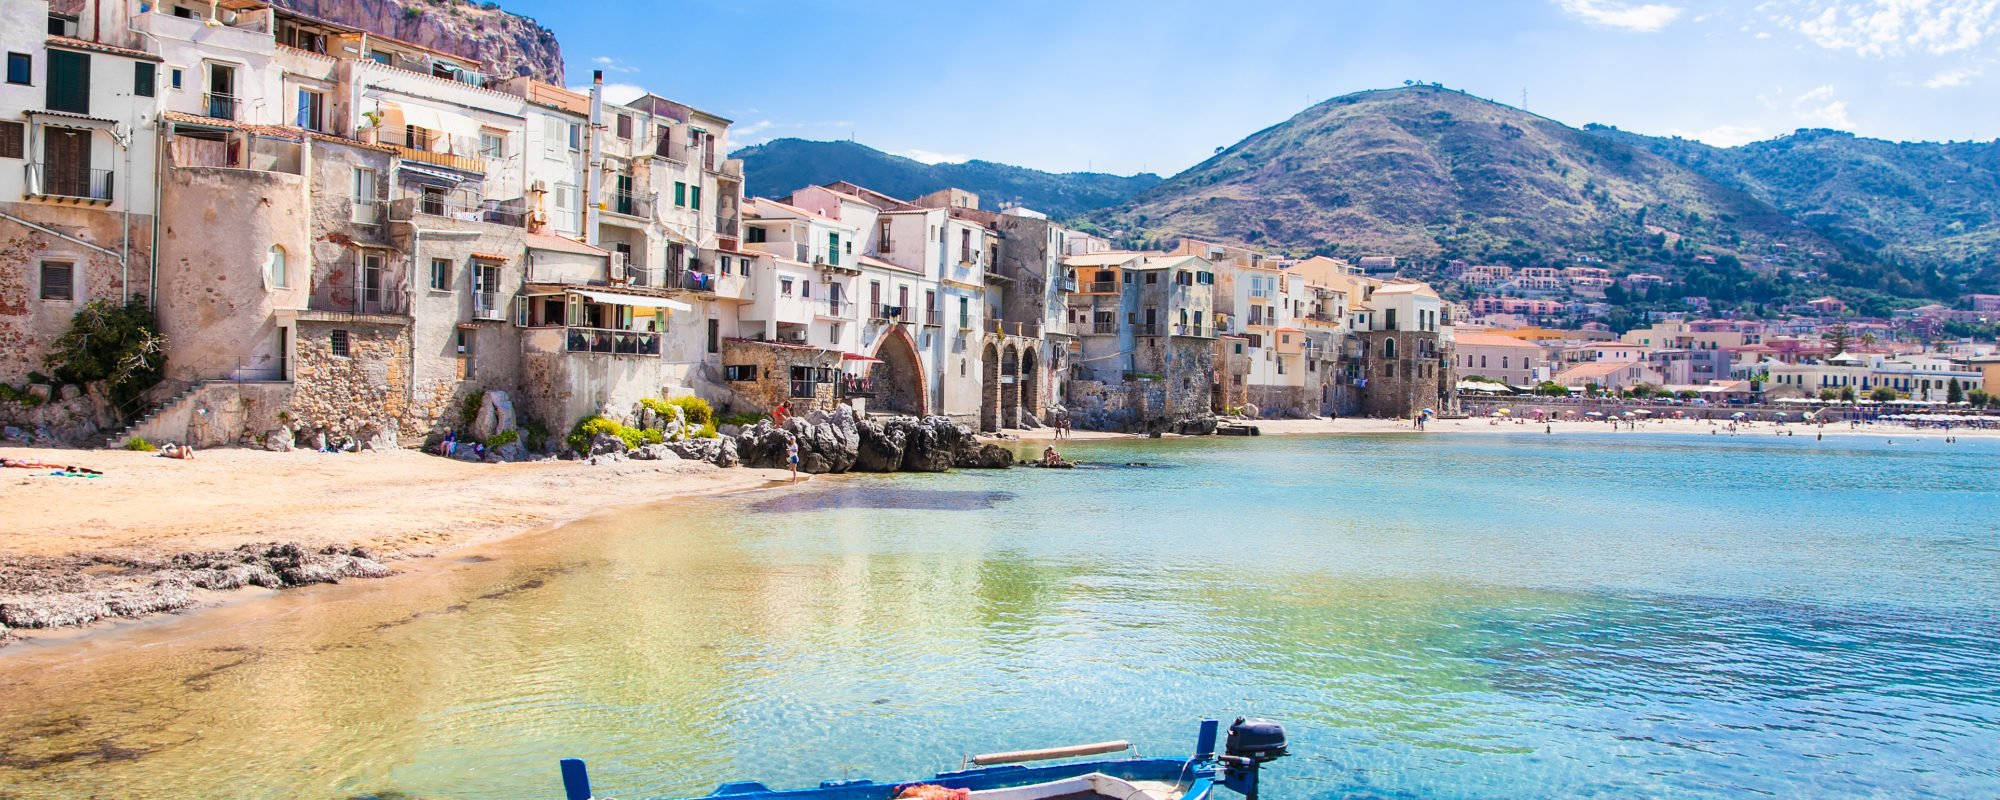 Harbor Stay Sicily